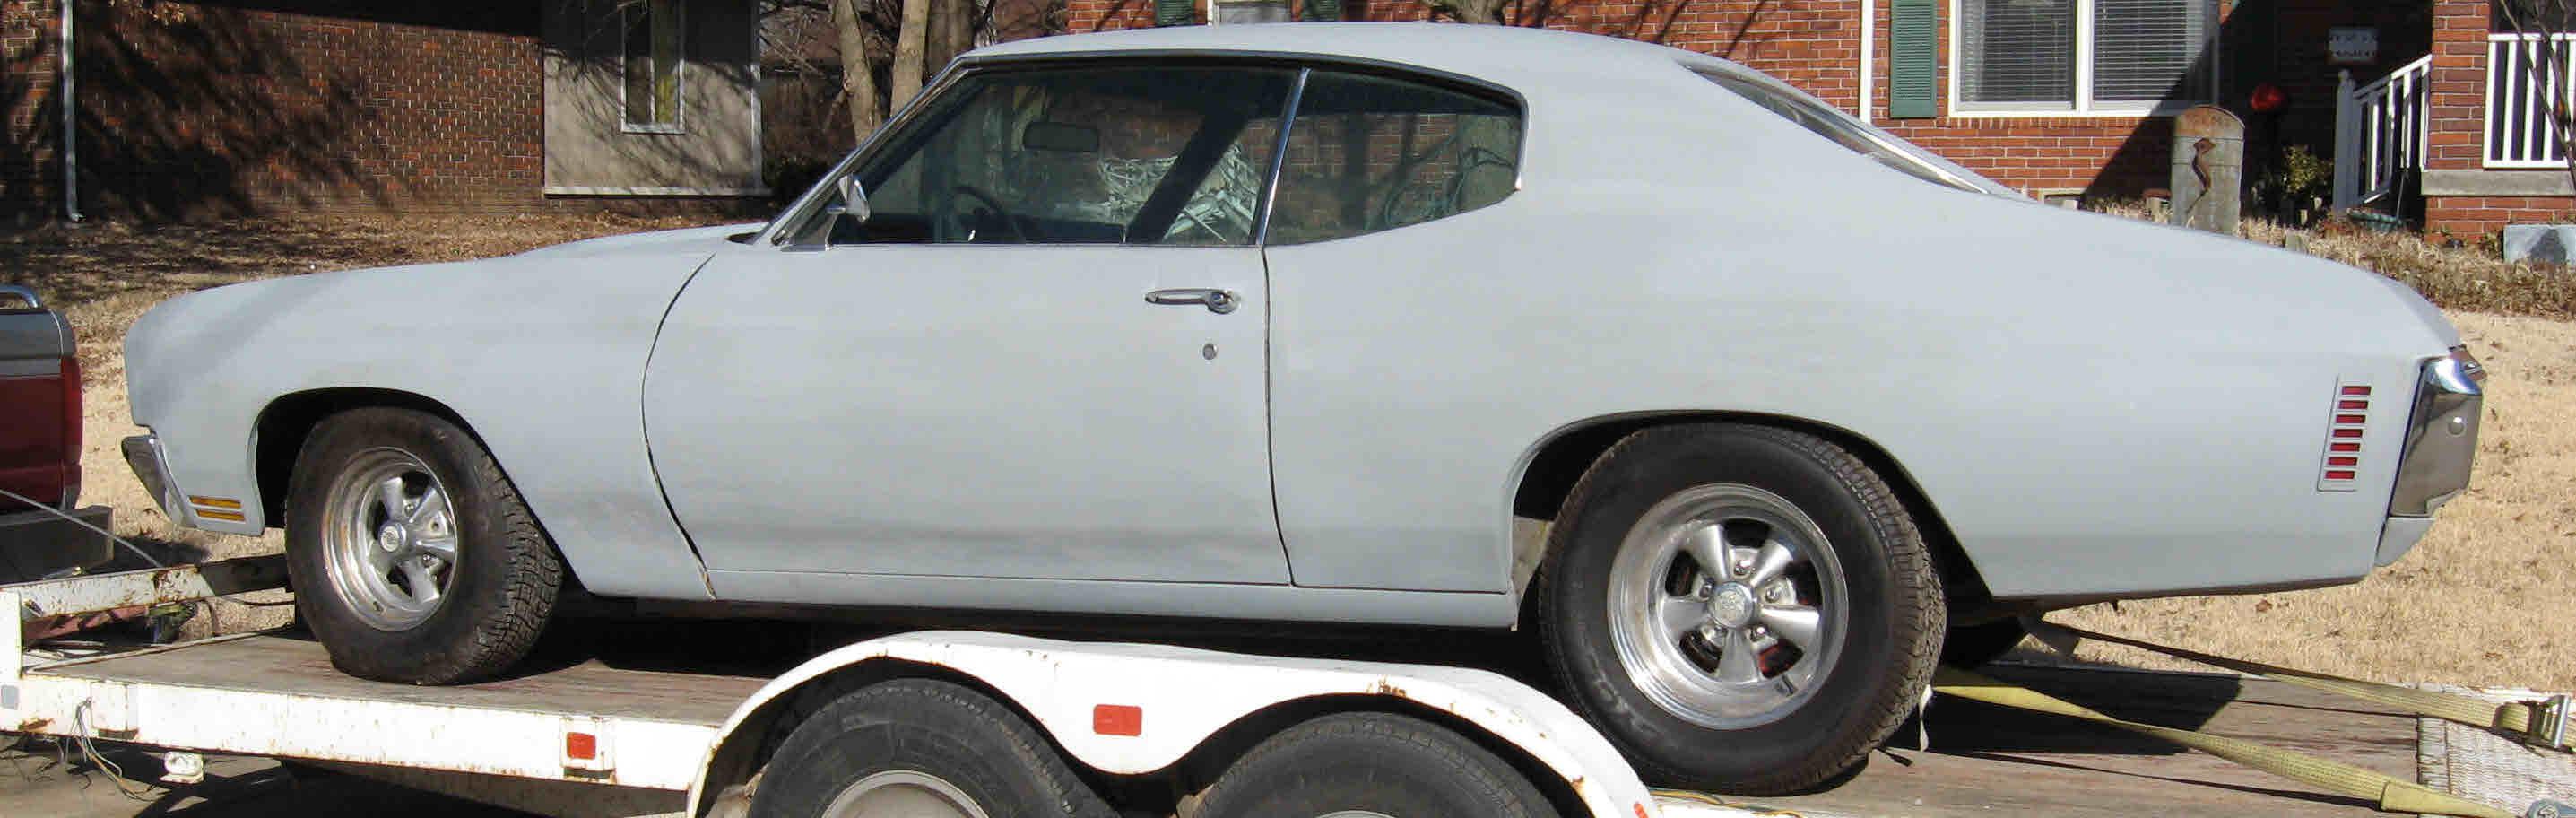 Loughmiller Motors 1966 Chevy C10 Door Panels 1970 Chevelle Malibu Sold Primered Built 454 400 Tranny Has Cowl Hood New Quarters 2 Hardtop Carpet Just Needs